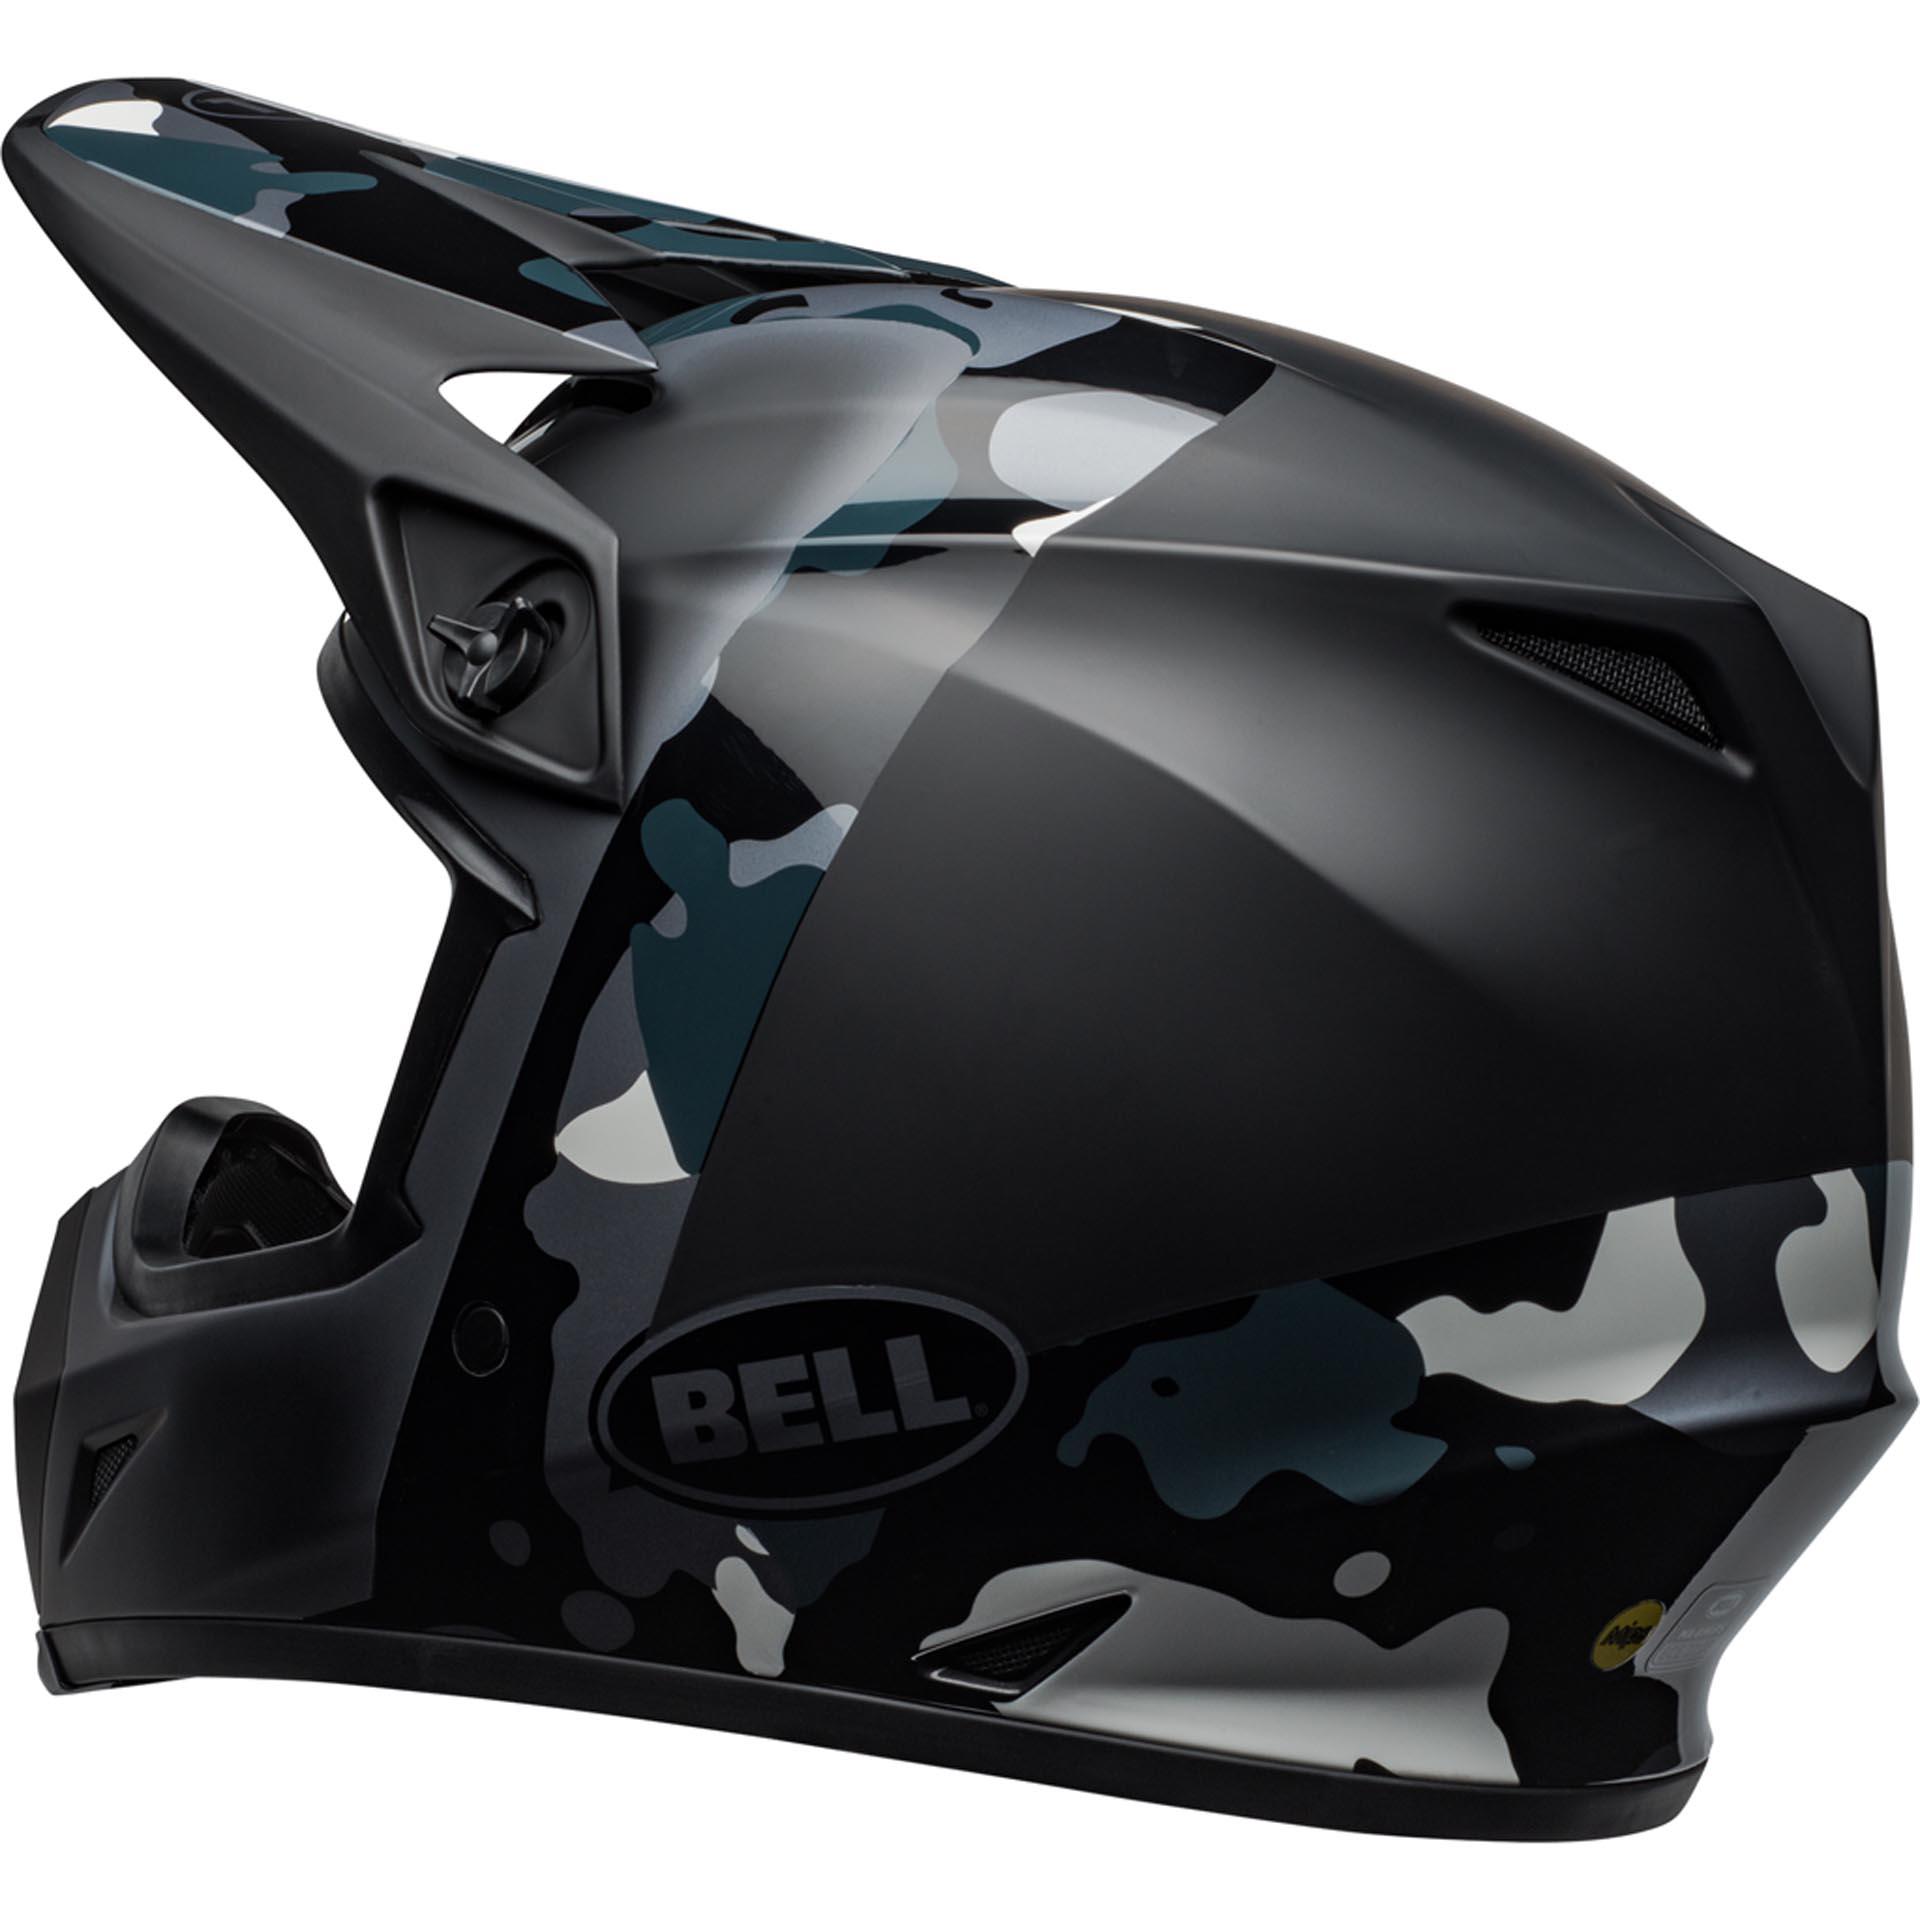 Bell MX-9 MIPS Off-Road Motorcycle Helmet Presence Matte//Gloss Black Titanium Camo, Large